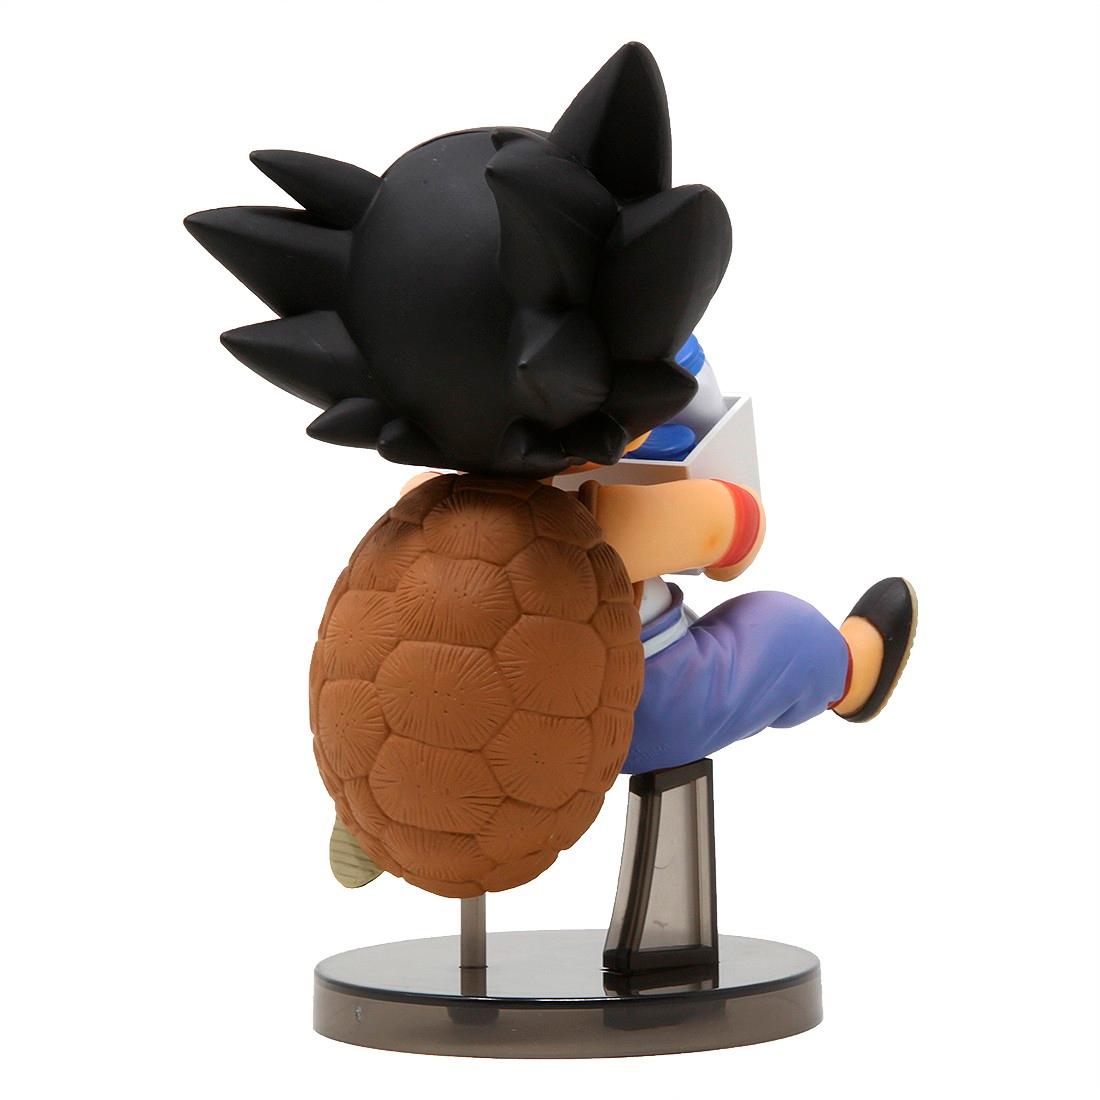 Banpresto Dragon Ball Z World Figure Colosseum 2 Vol. 7 Son Goku